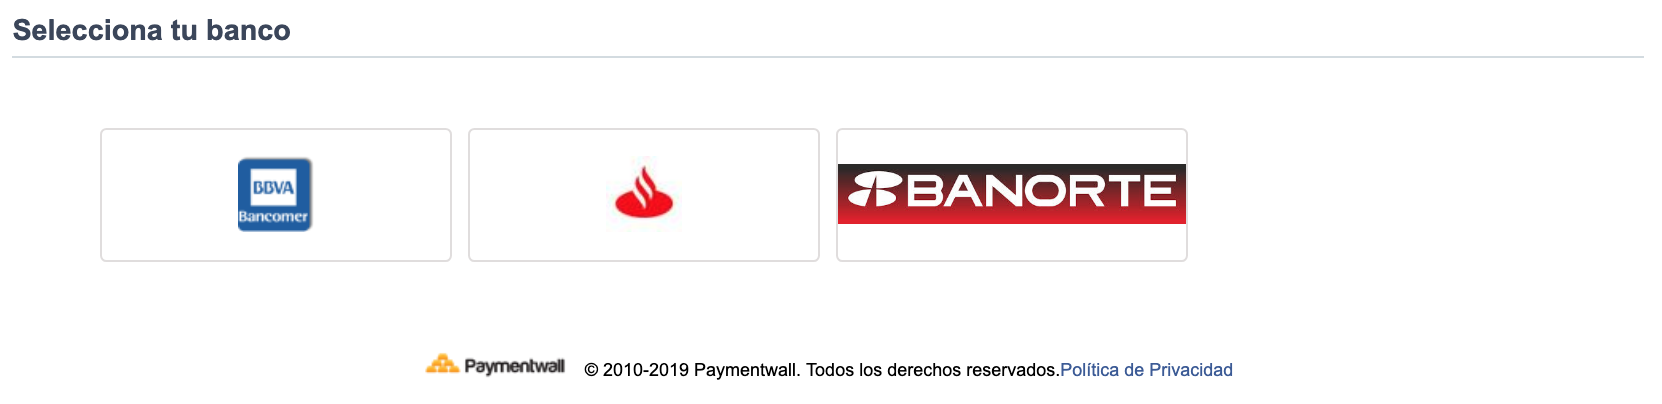 Bank Transfer Mexico select